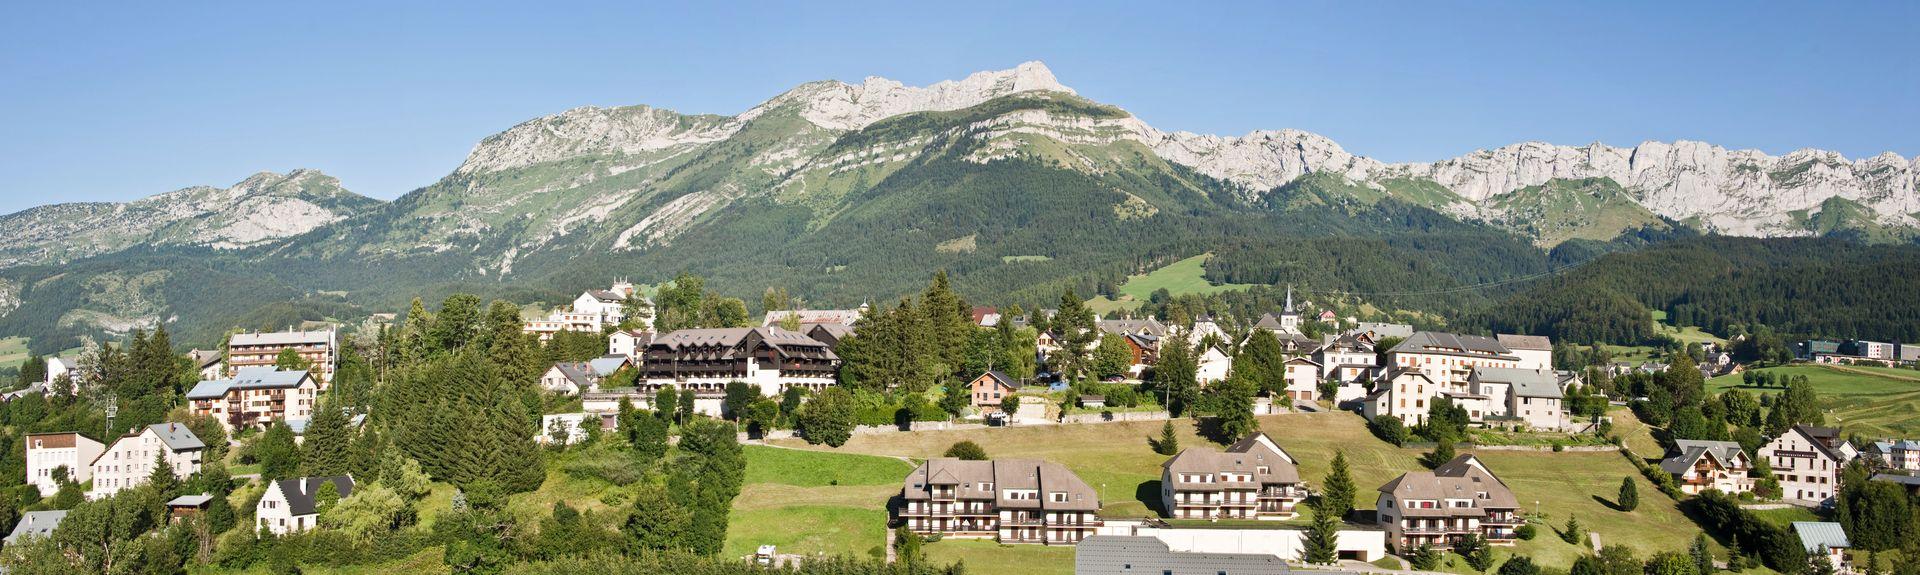 Villard-de-Lans, Auvergne-Rhône-Alpes, França